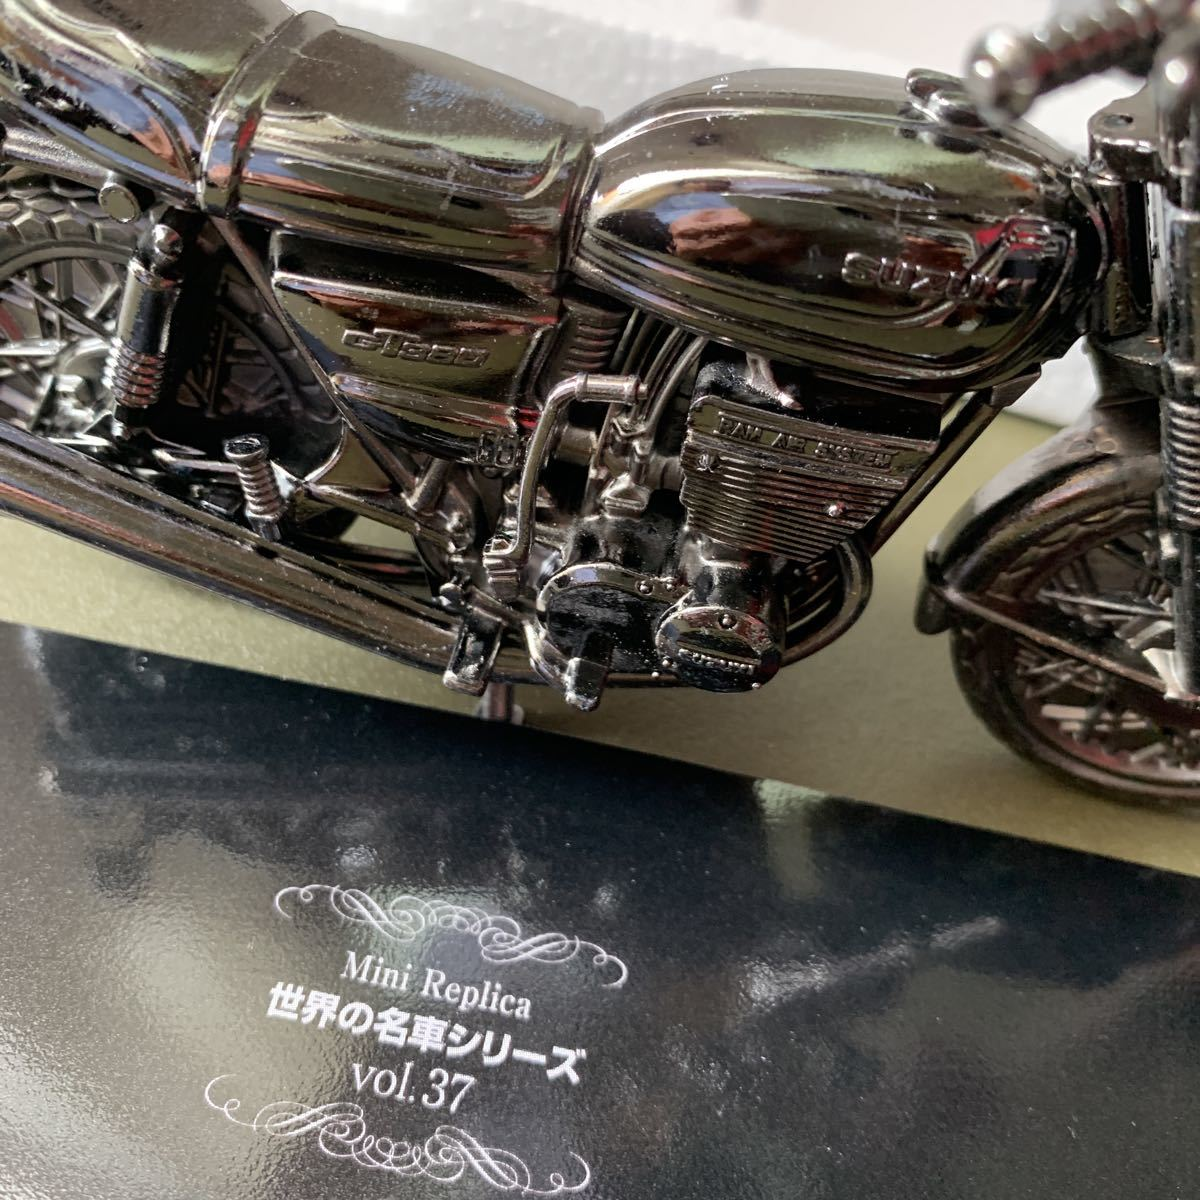 K_DSC0054 世界の名車シリーズ vol.37 SUZUKI GT380 レッドバロン ミニレプリカ バイクのインテリアミニカー_画像9